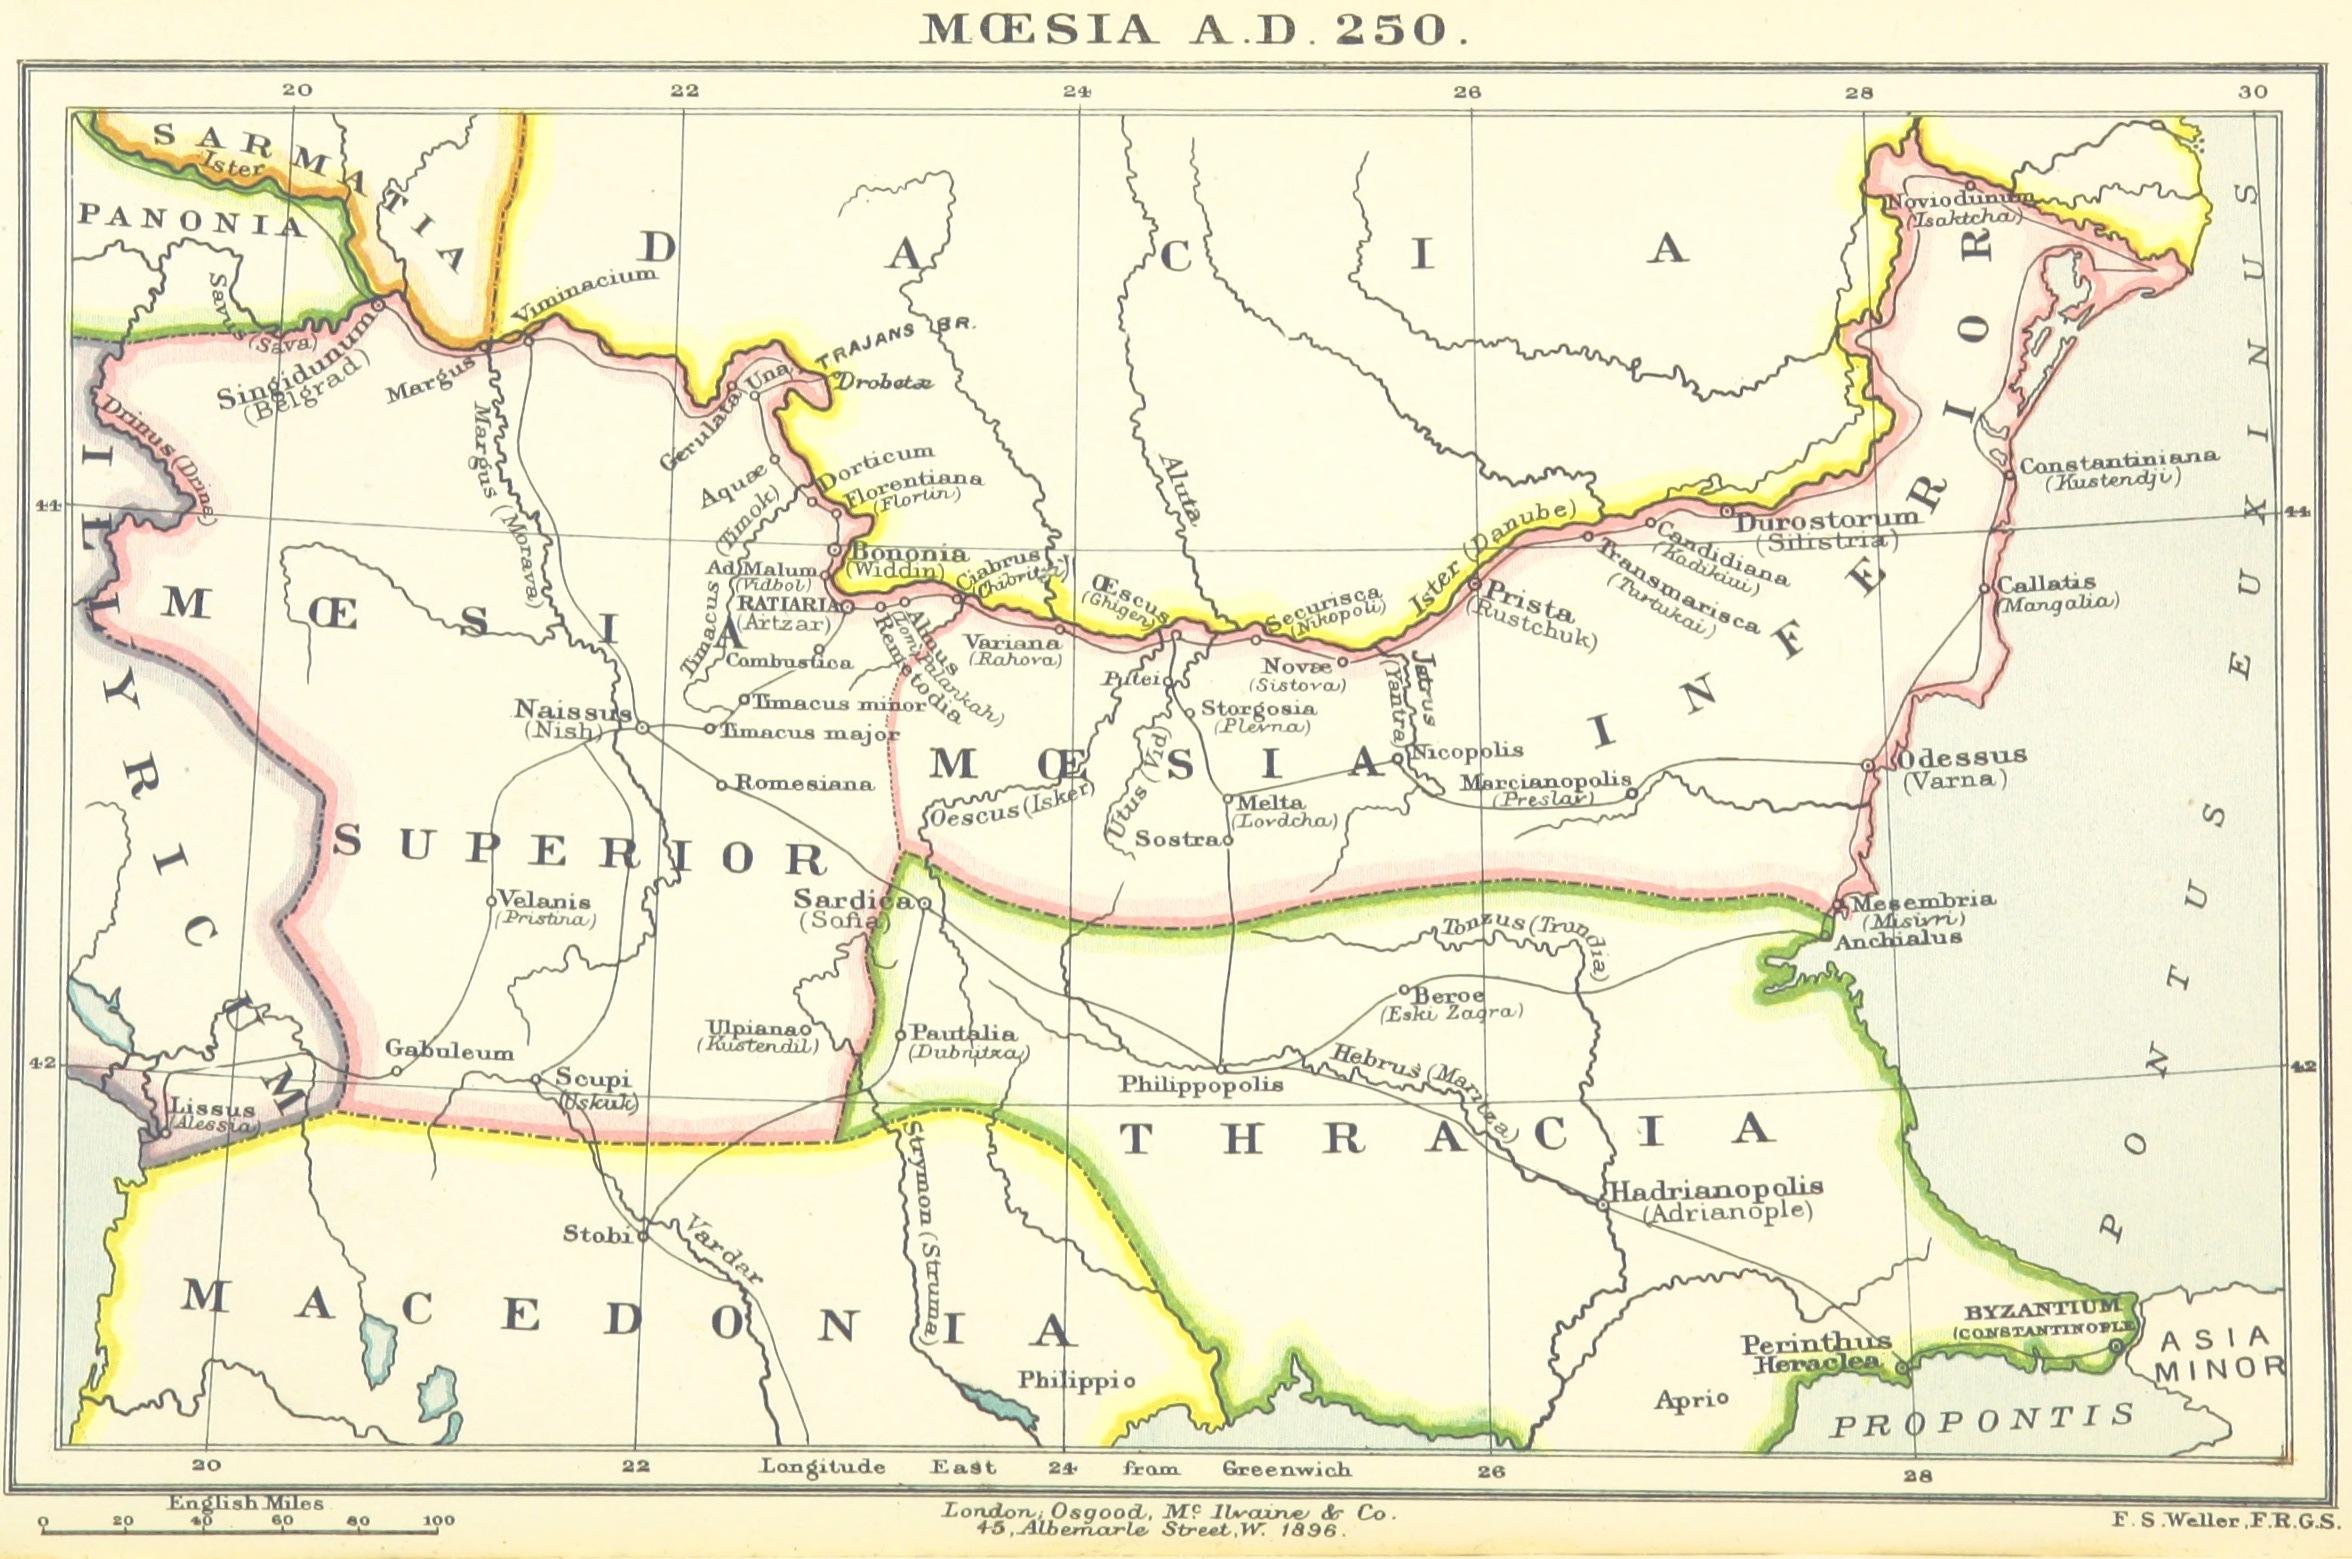 Goti. Mappa Mesia Inferiorie e Mesia Superiore. 250 d.C.